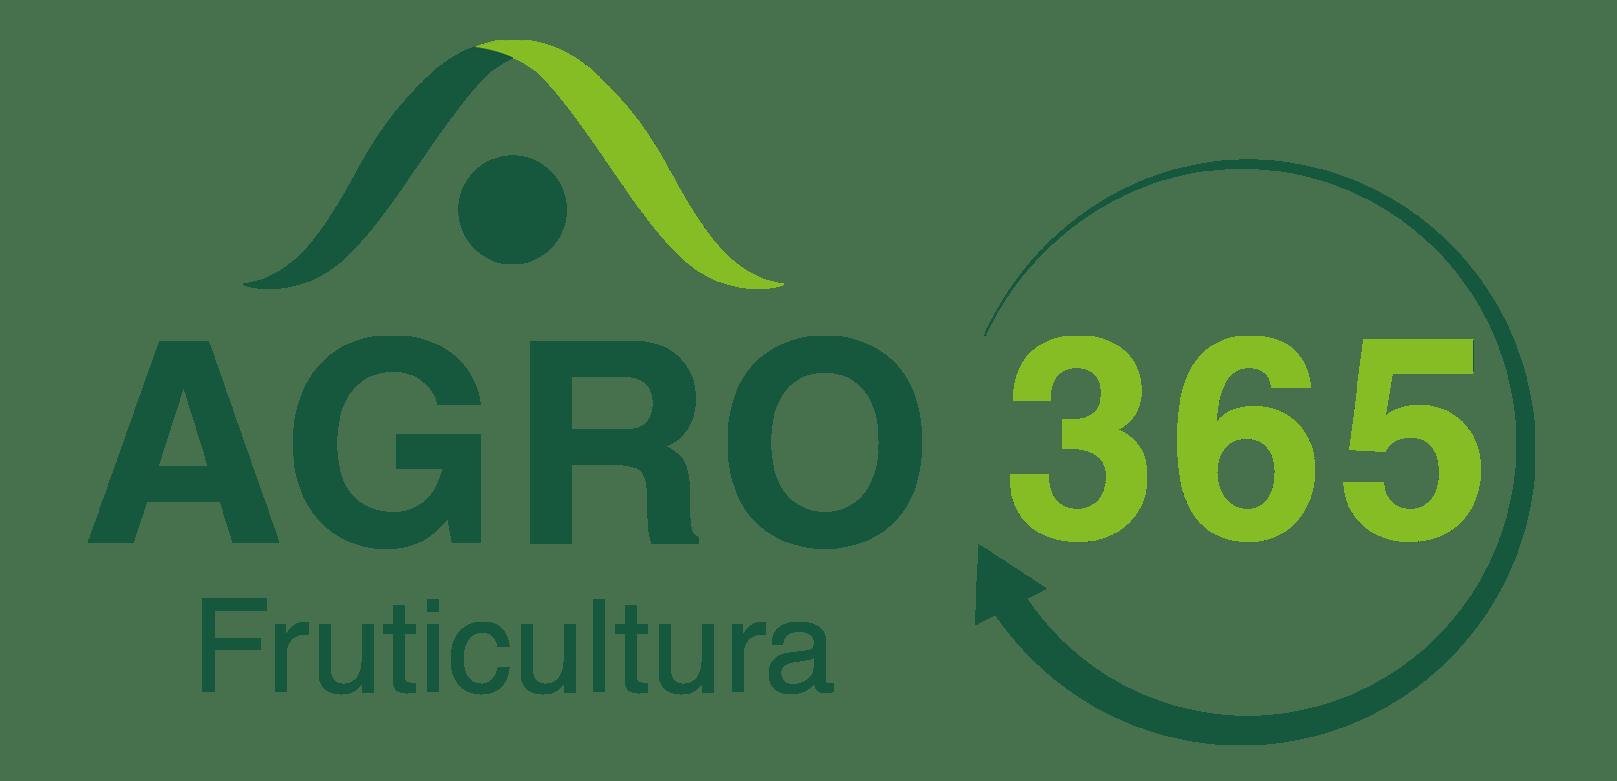 fruticultura-vertical.png